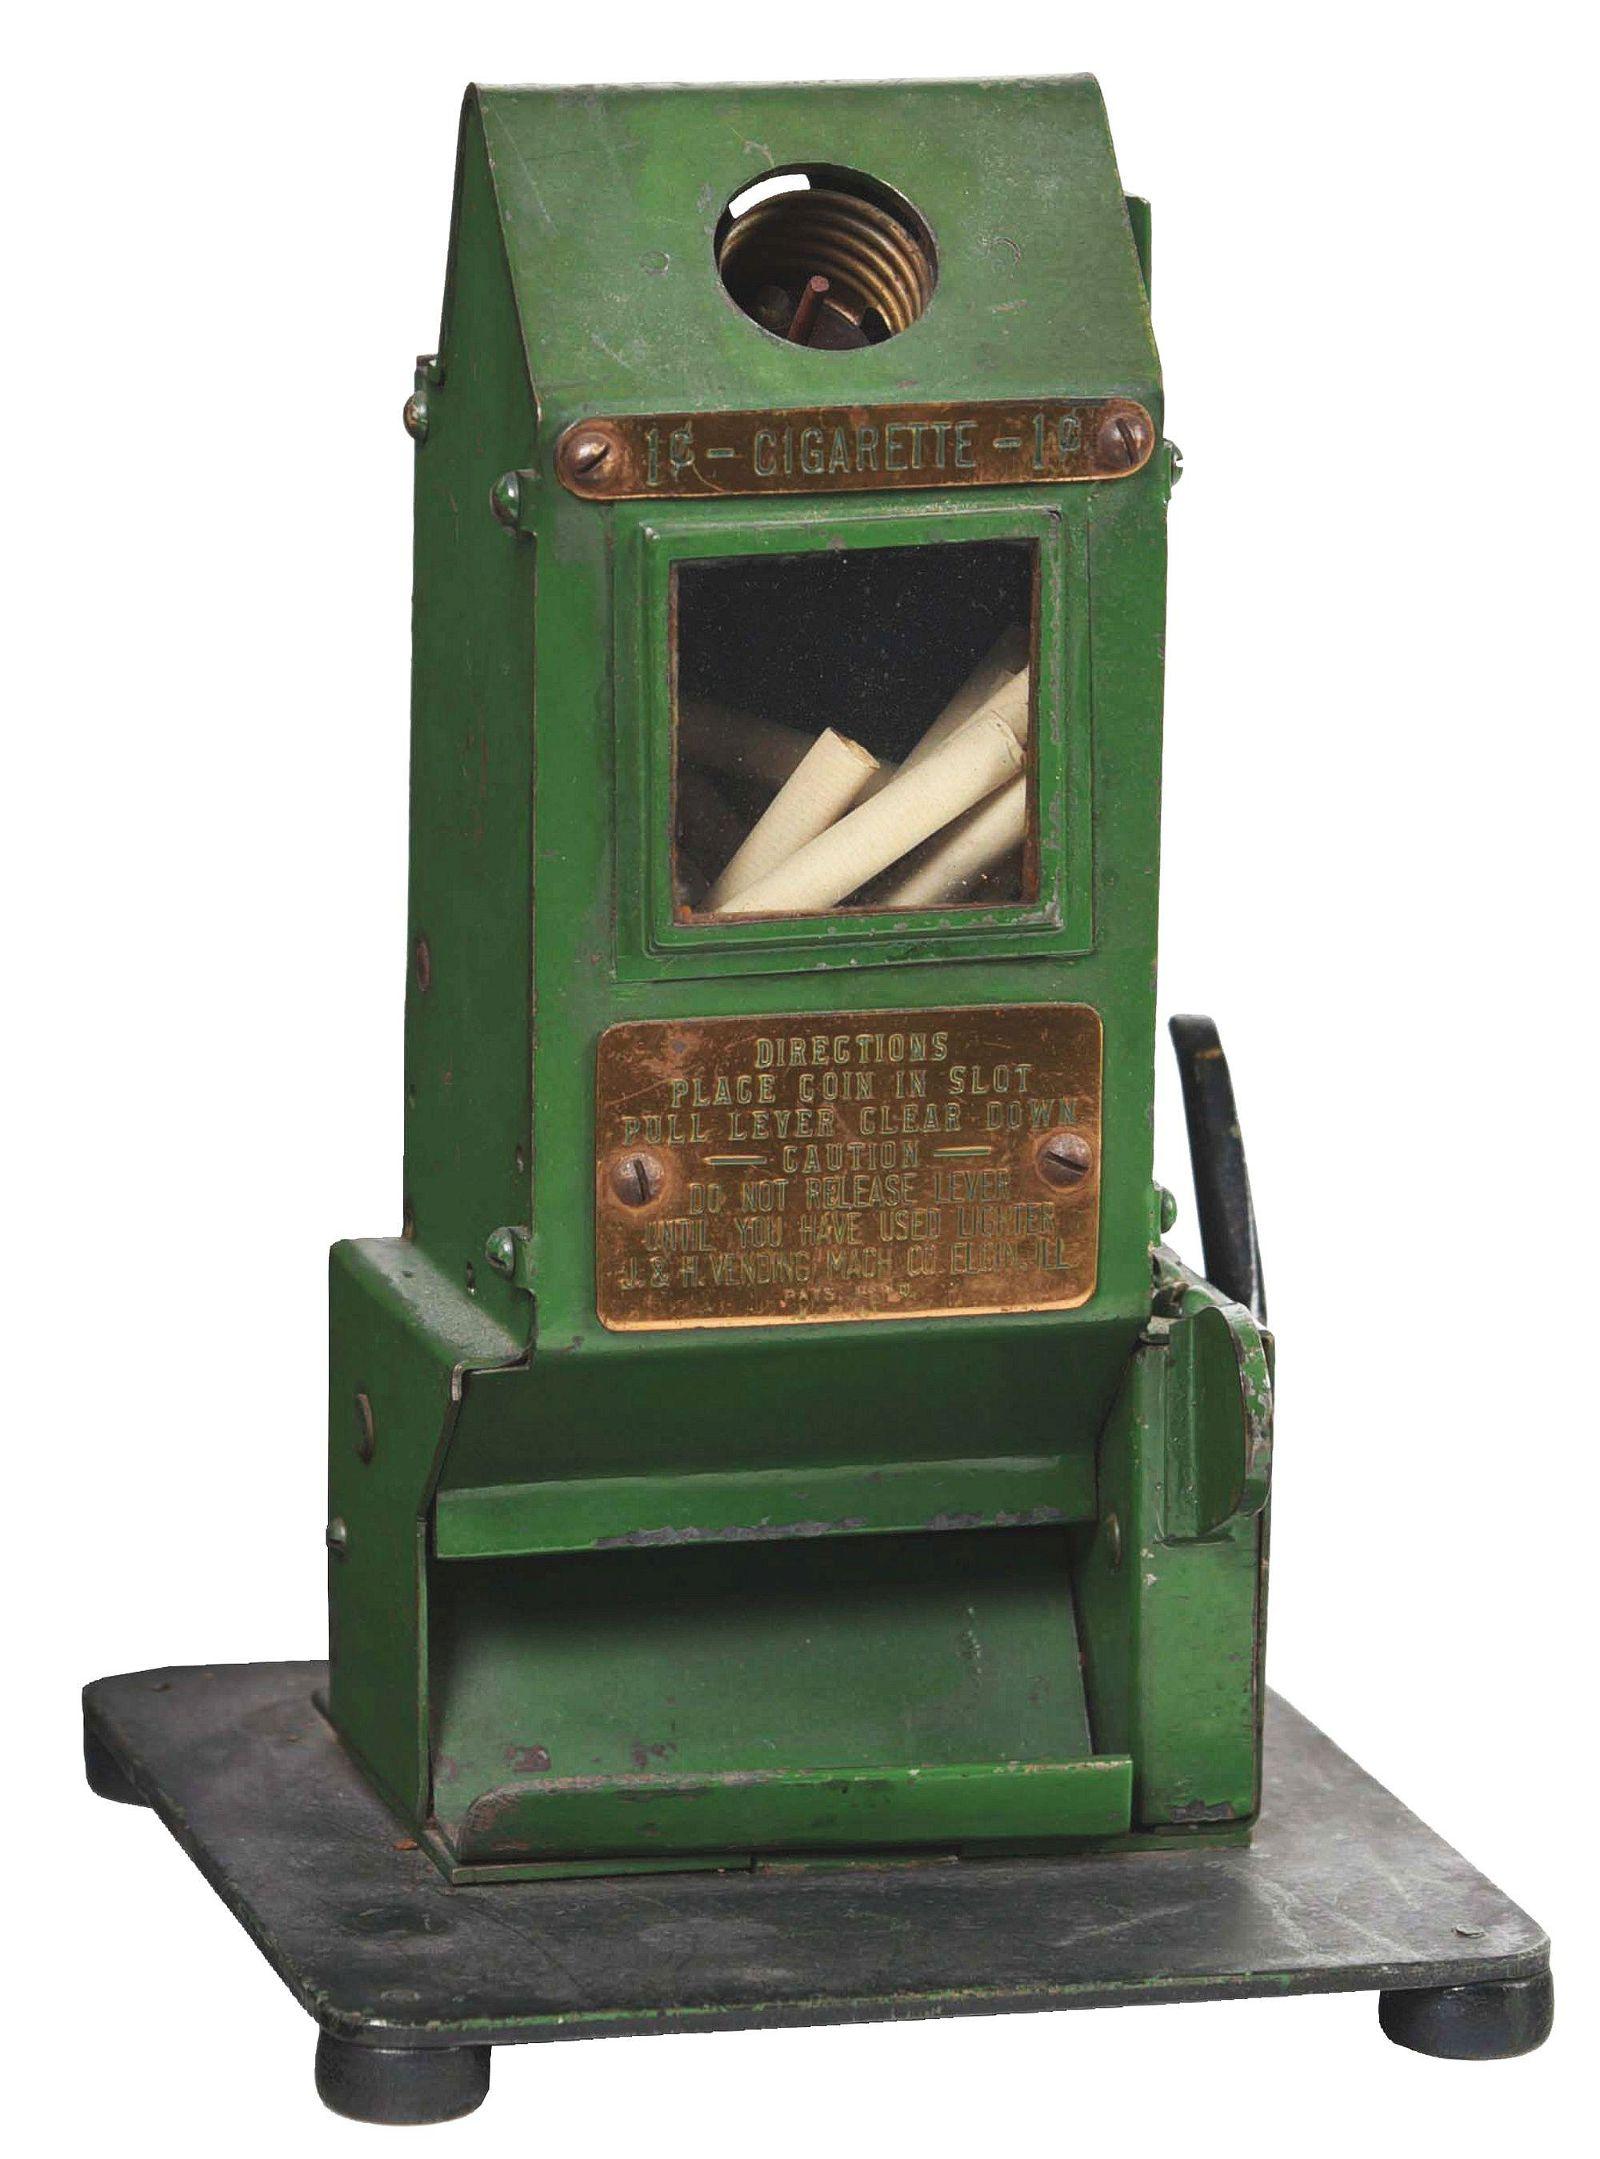 1¢ J & H CIGARETTE VENDING MACHINE WITH LIGHTER.